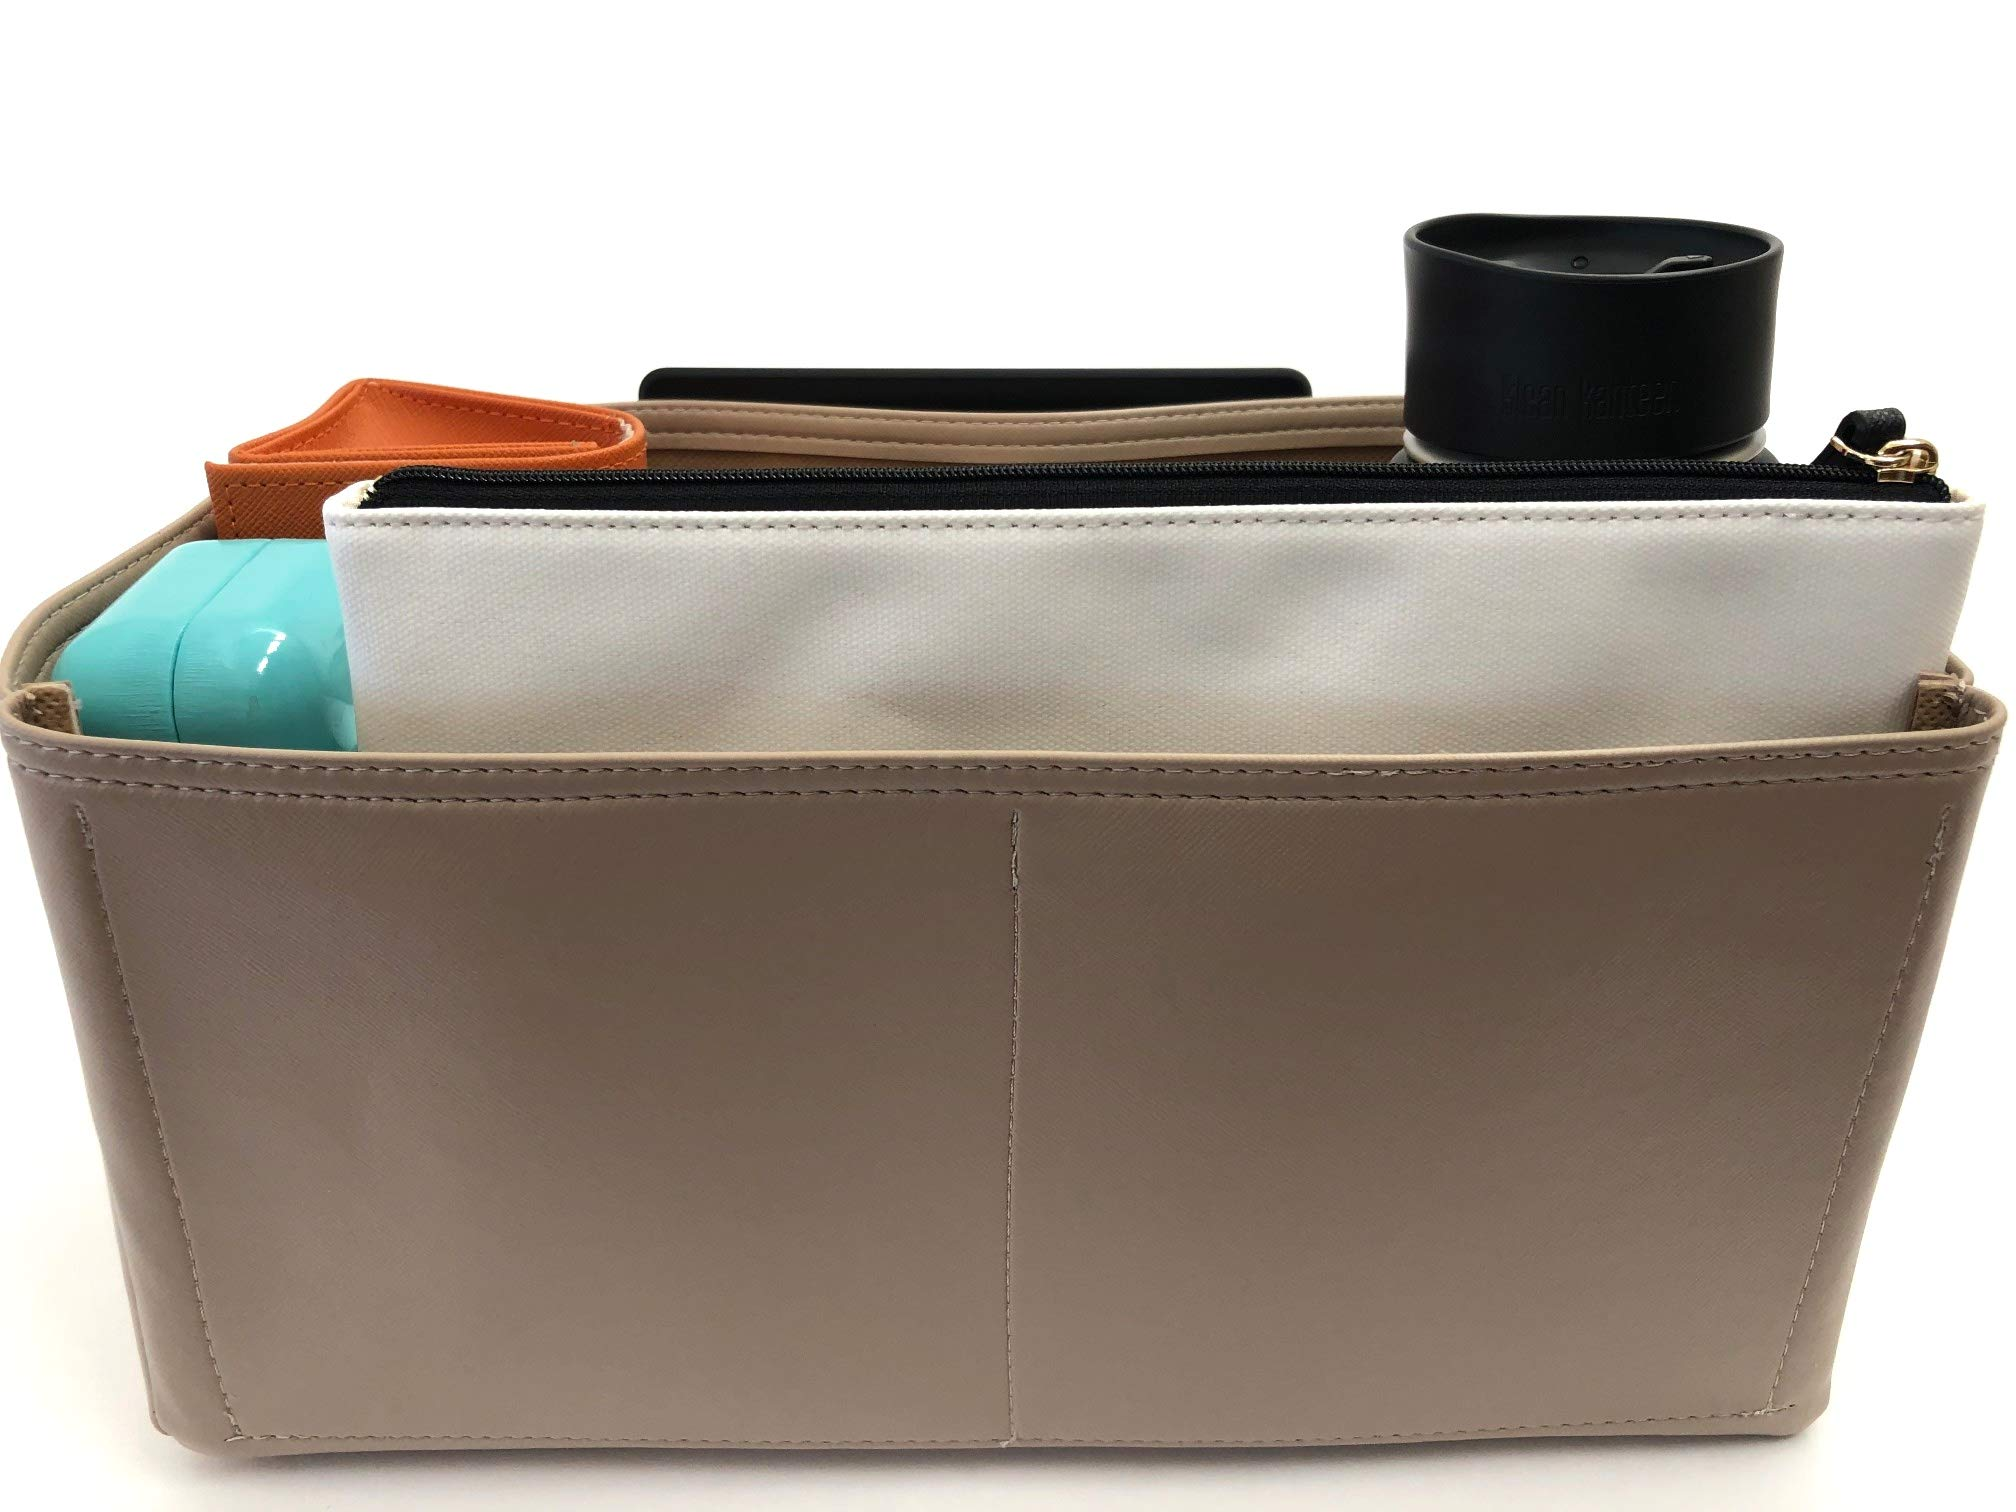 Purse Organizer Insert for Hermes Garden Party Handbag - Fits inside Hermes Garden Party 36 bag - Vegan Leather (36, Beige)